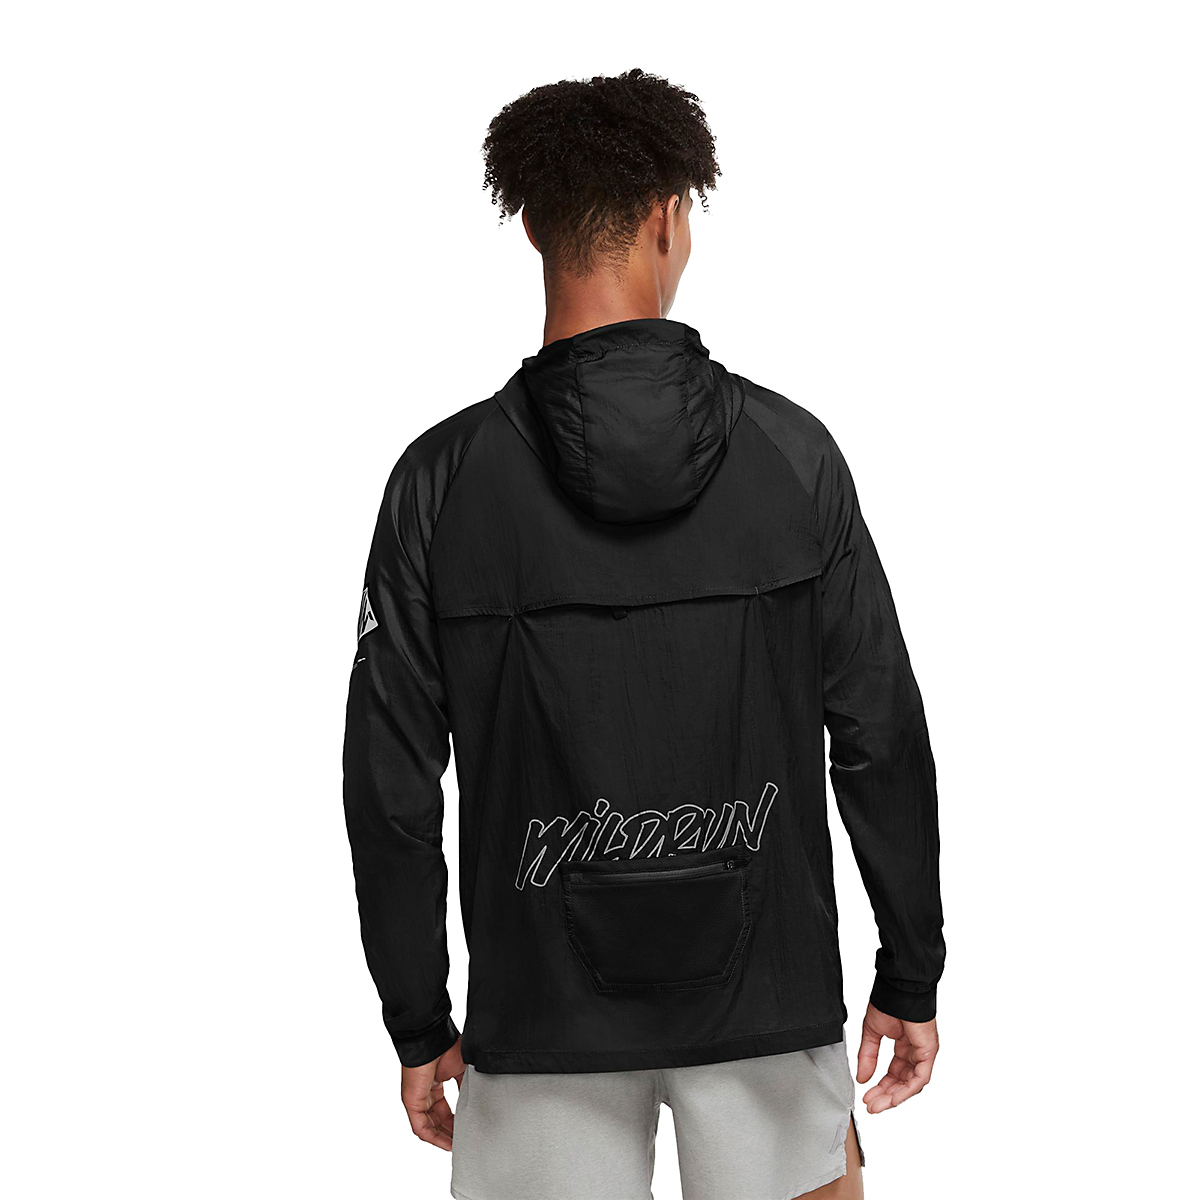 Men's Nike Windrunner Wild Run Running Jacket - Color: Black/Dark Smoke Grey/Claystone Red - Size: S, Black/Dark Smoke Grey/Claystone Red, large, image 2